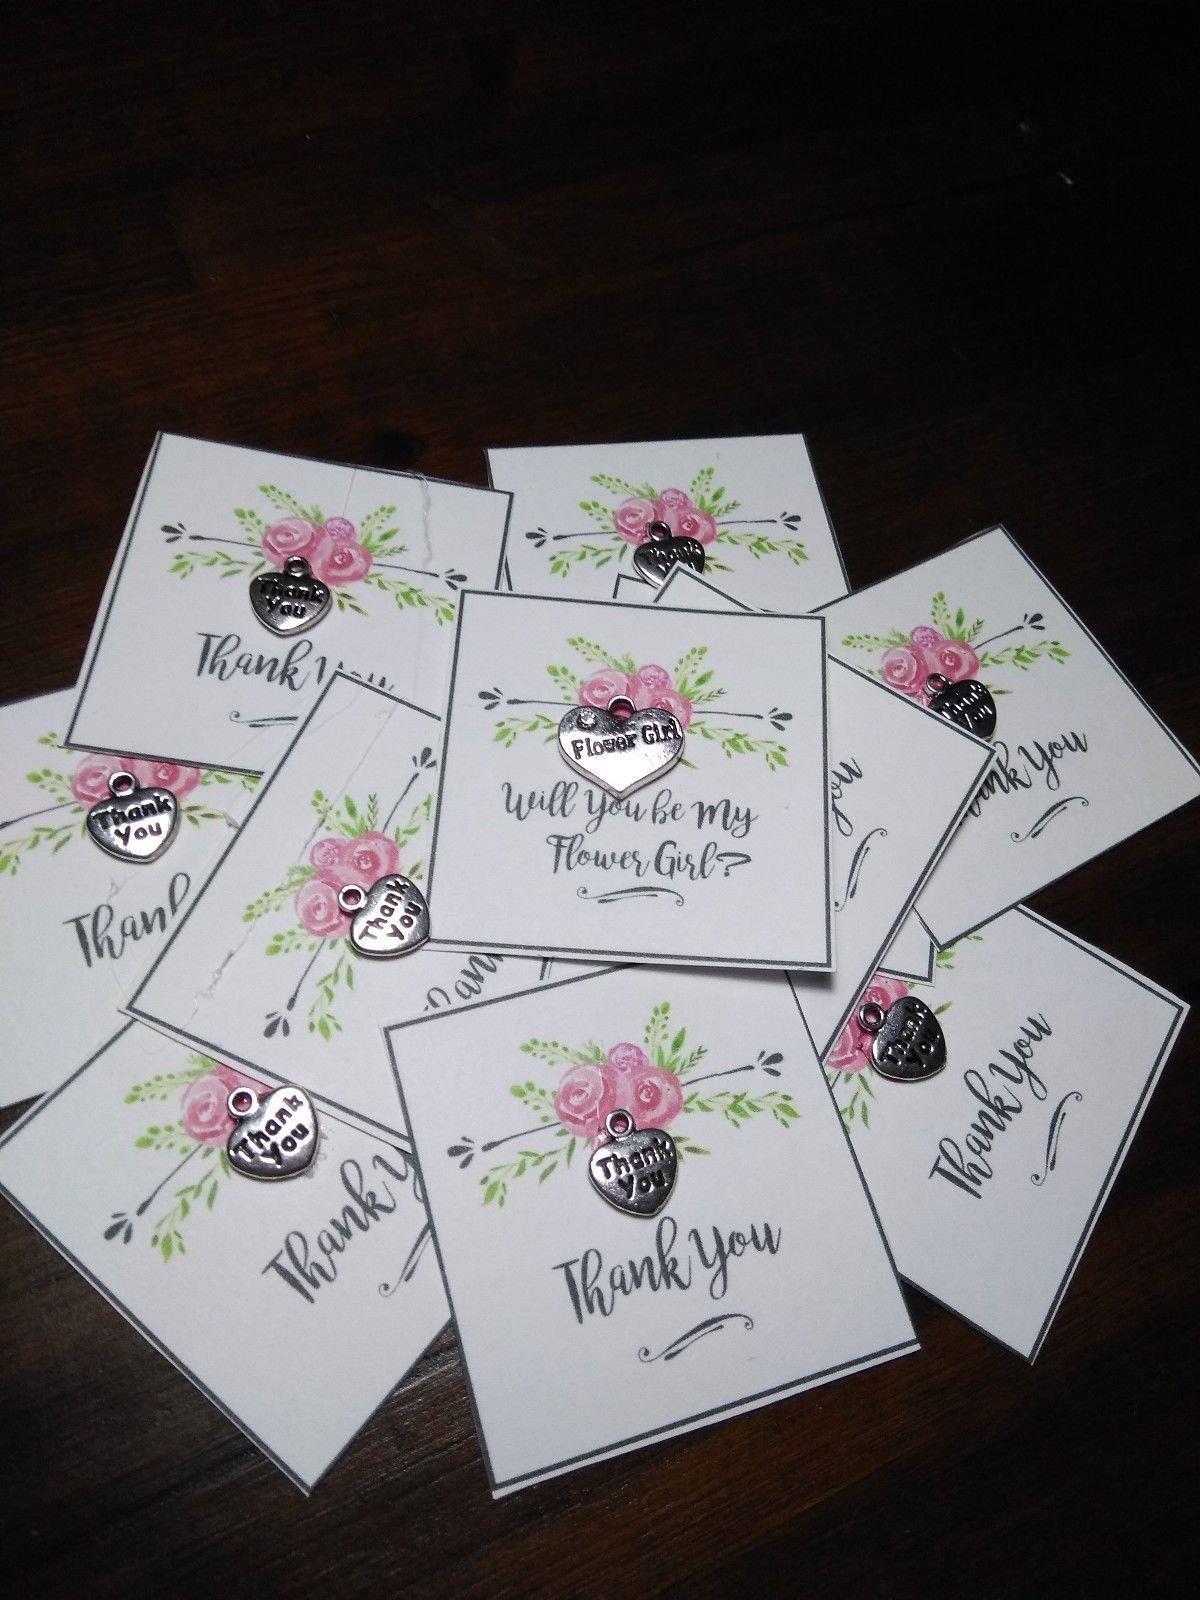 6 Wedding Bridesmaids Thank You Small Gift Card With A Small Charm Small Thank You Gift Bridesmaid Thank You Wedding Tree Guest Book